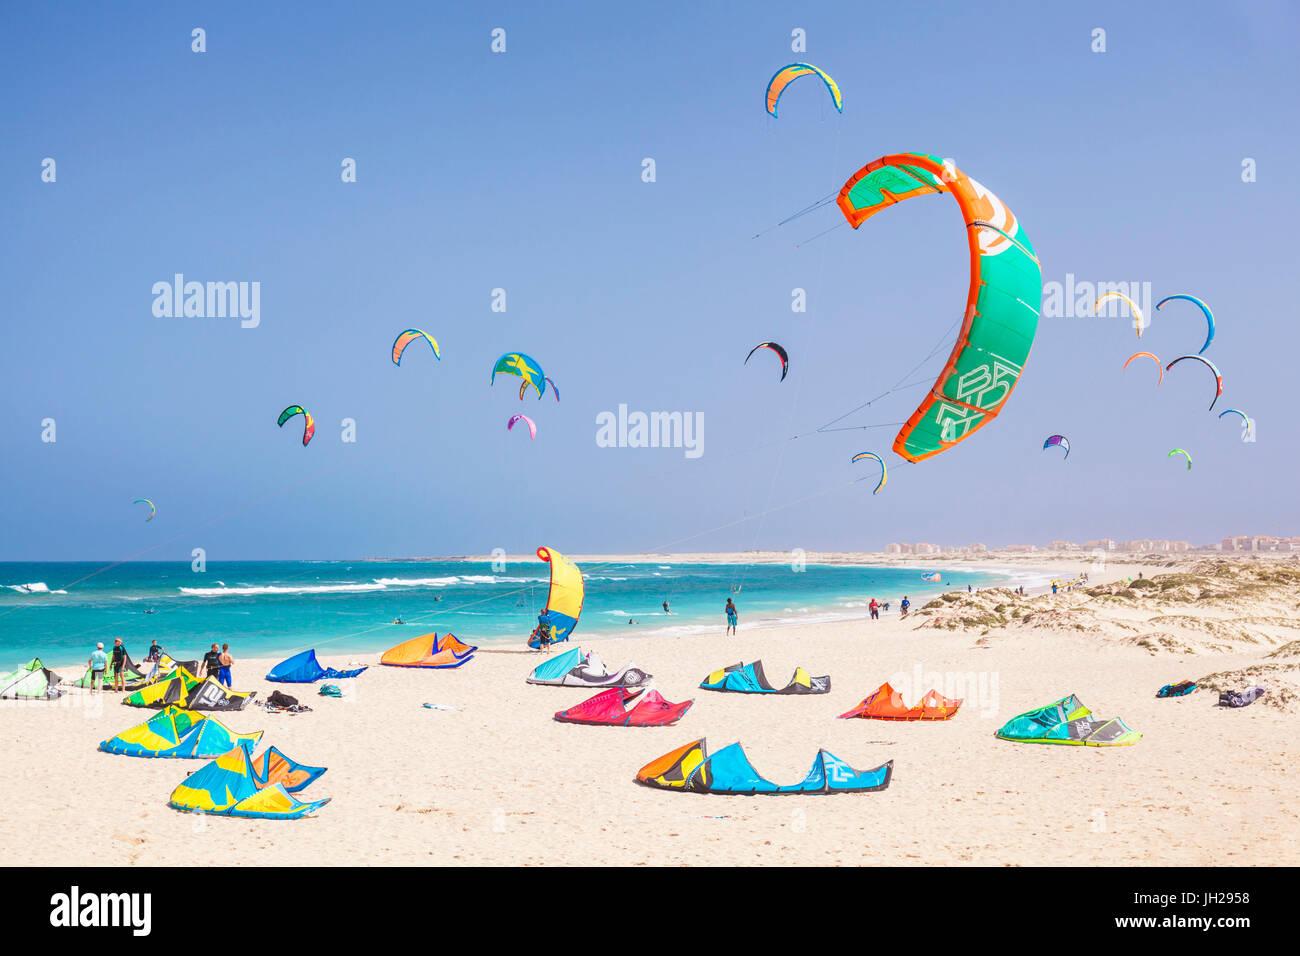 Kite surfeurs et kite surf sur la plage de Kite, Praia da Fragata, Costa da Fragata, Santa Maria, île de Sal, Photo Stock